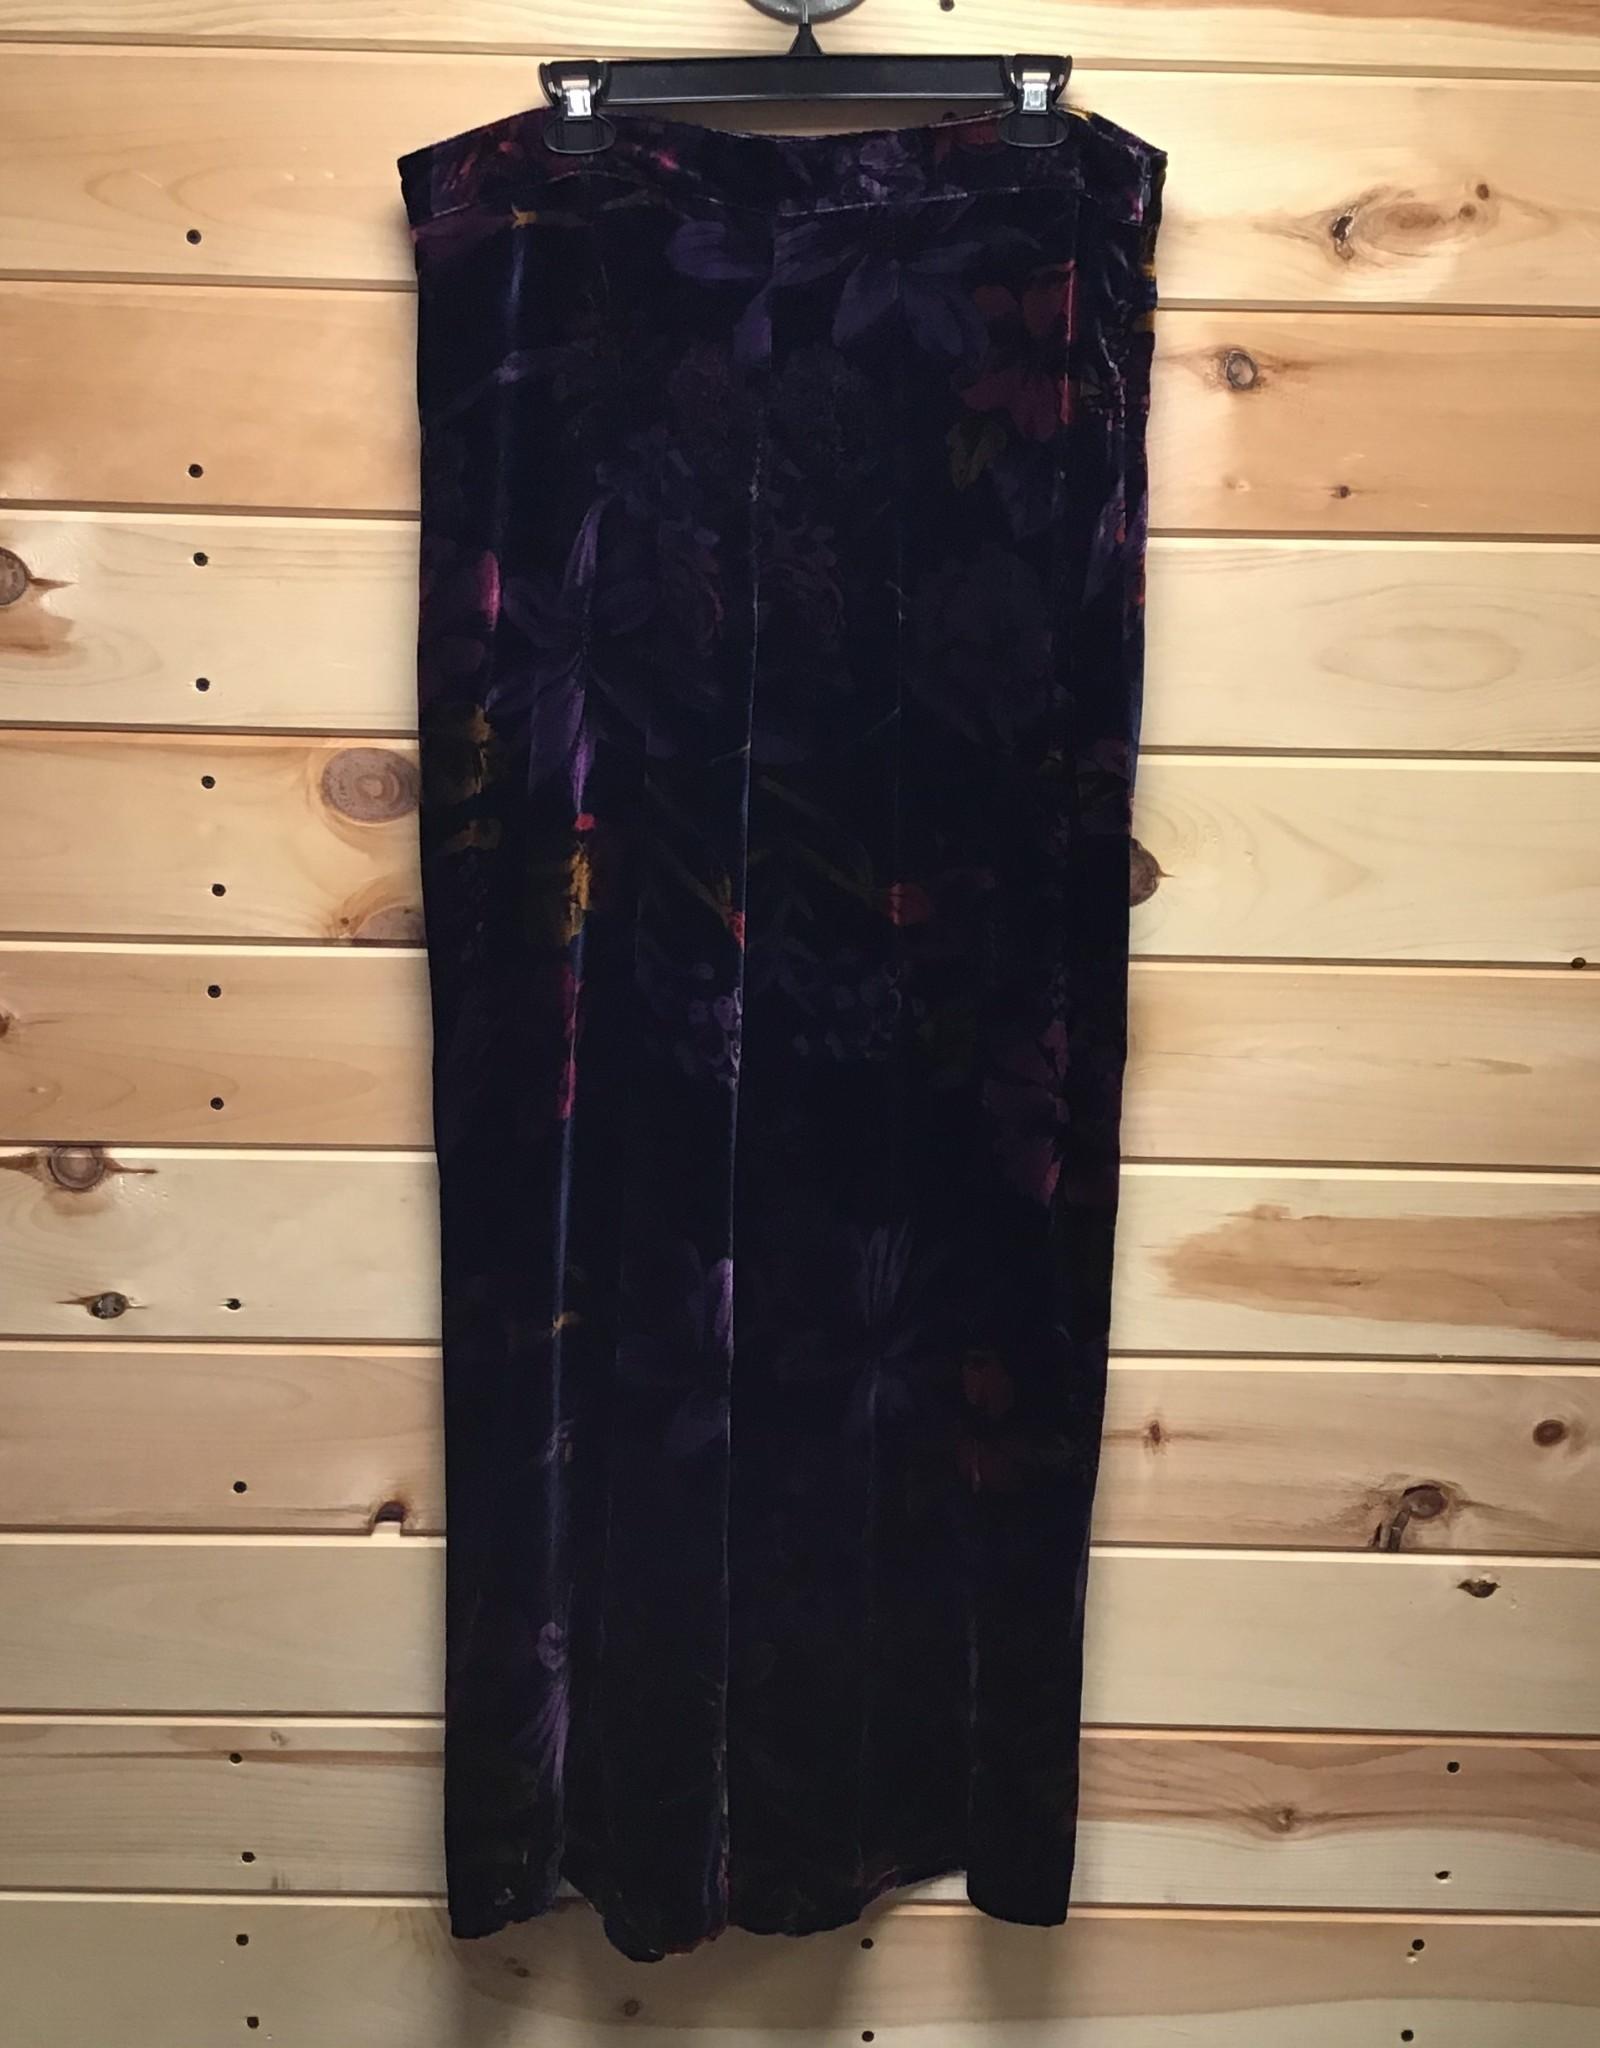 TRINA TURK Trina Turk Penelope Floral Print Velour Pants Sz 12